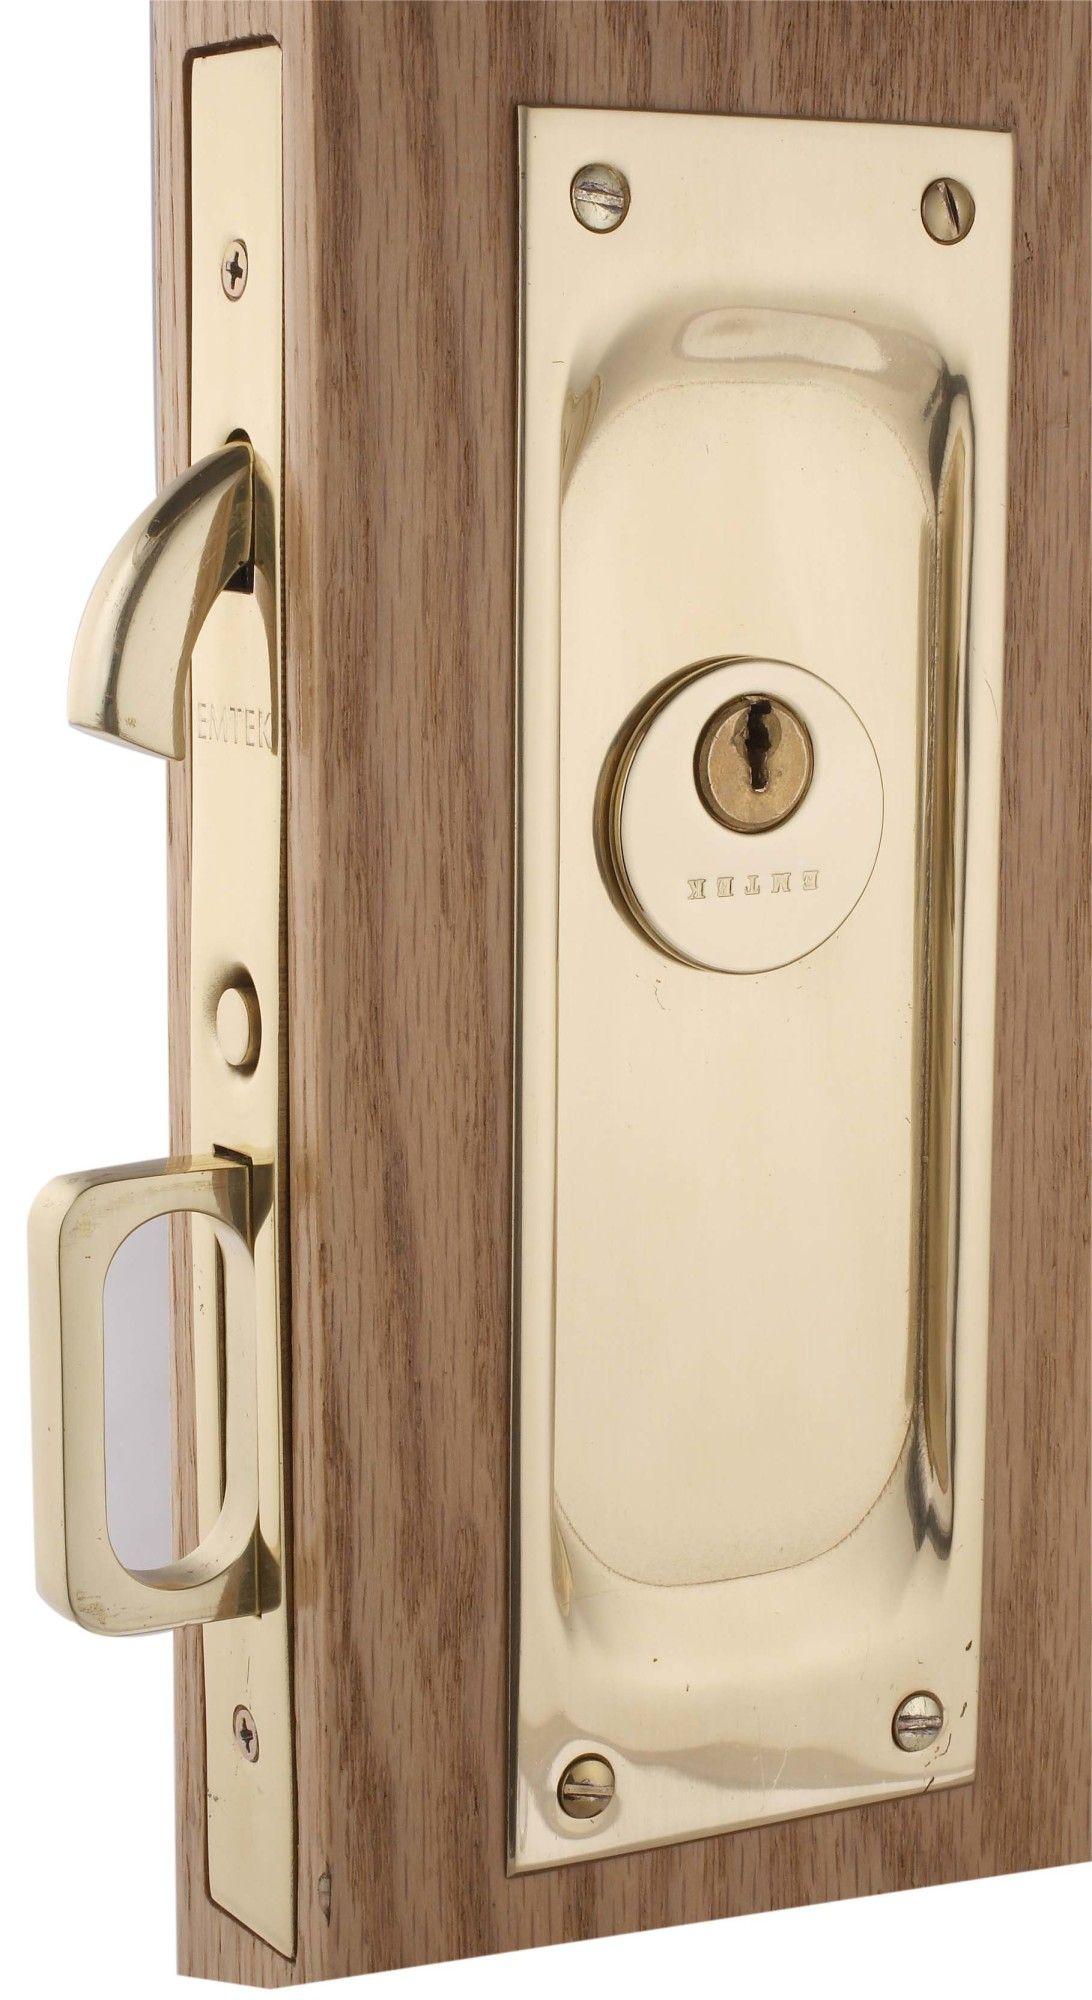 Emtek 2103twb Tumbled White Bronze 7 1 2 Height Solid Brass Keyed Entry Pocket Door Mortise Lock Pocket Doors Mortise Lock Emtek